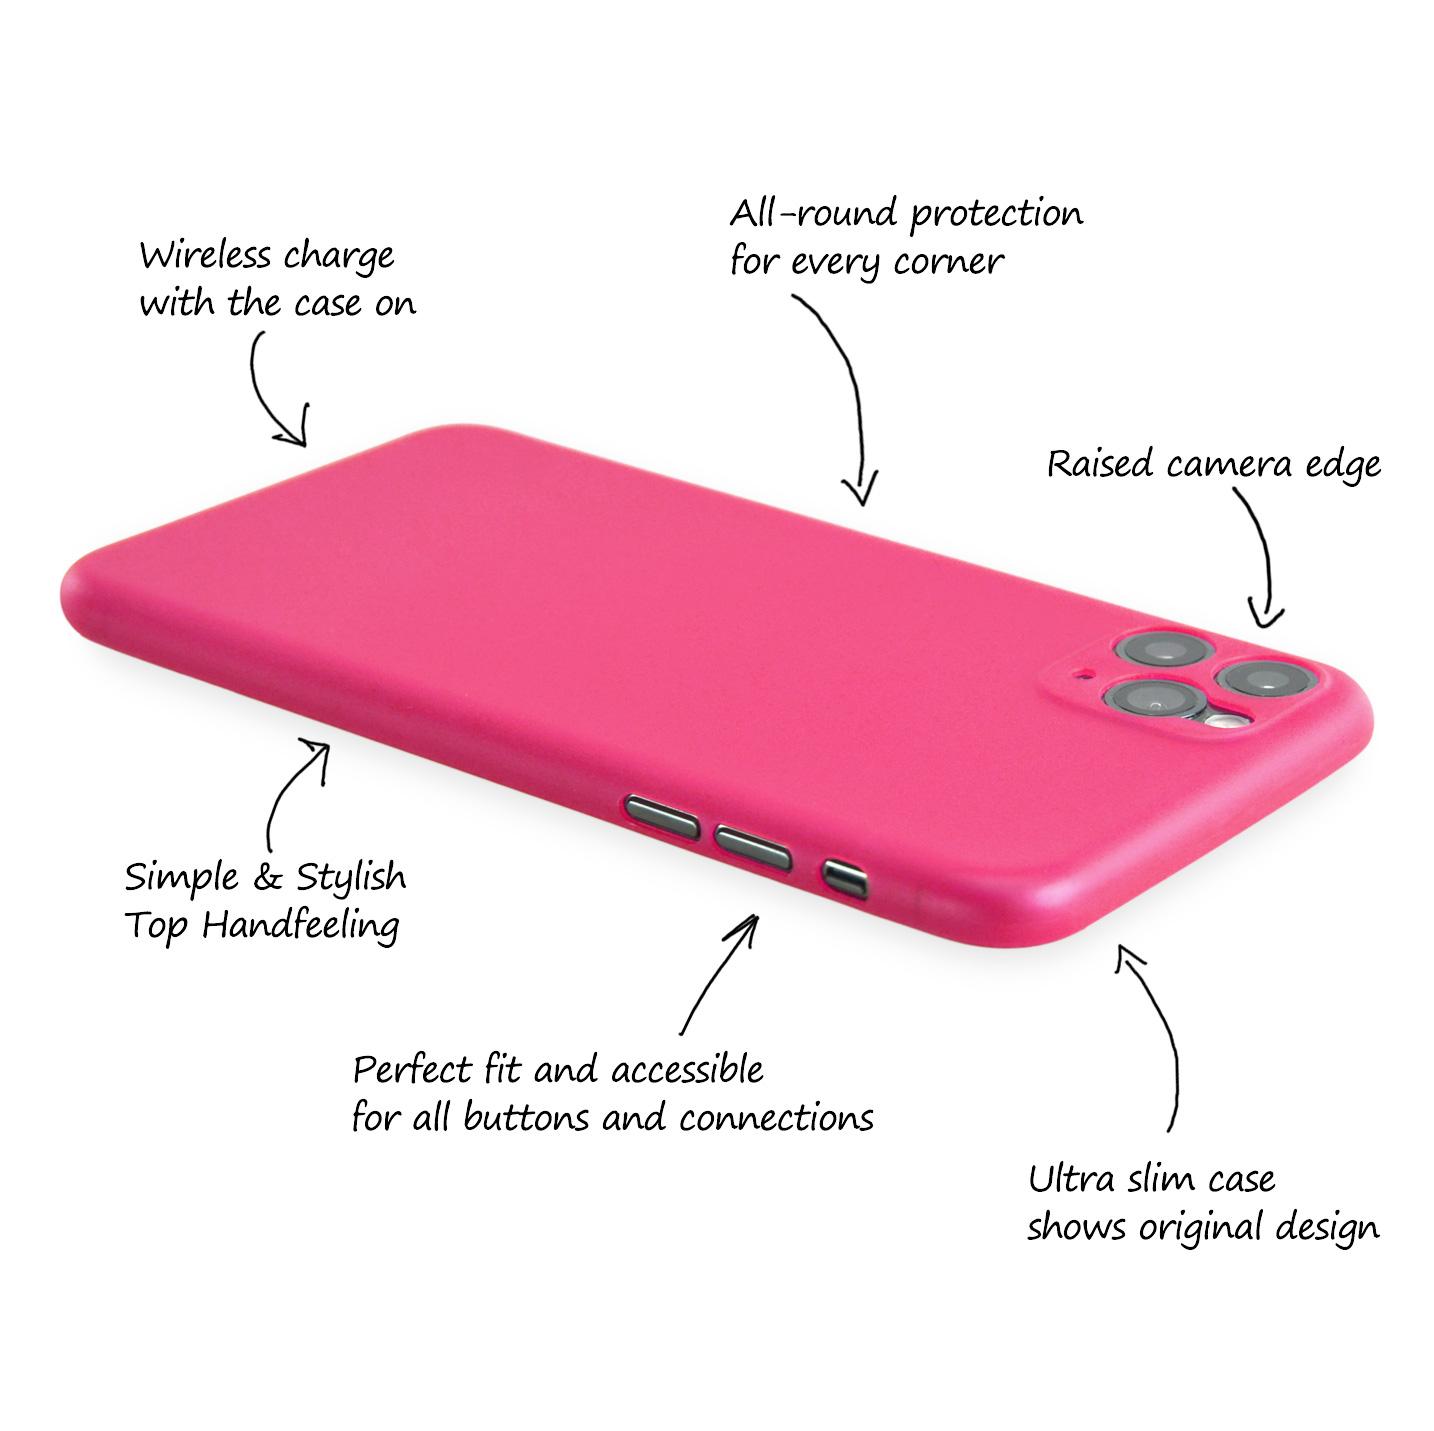 Ultra-Slim-Case-iPhone-11-Pro-5-8-034-Matt-Clear-Schutz-Huelle-Skin-Cover-Etui-Folie Indexbild 18